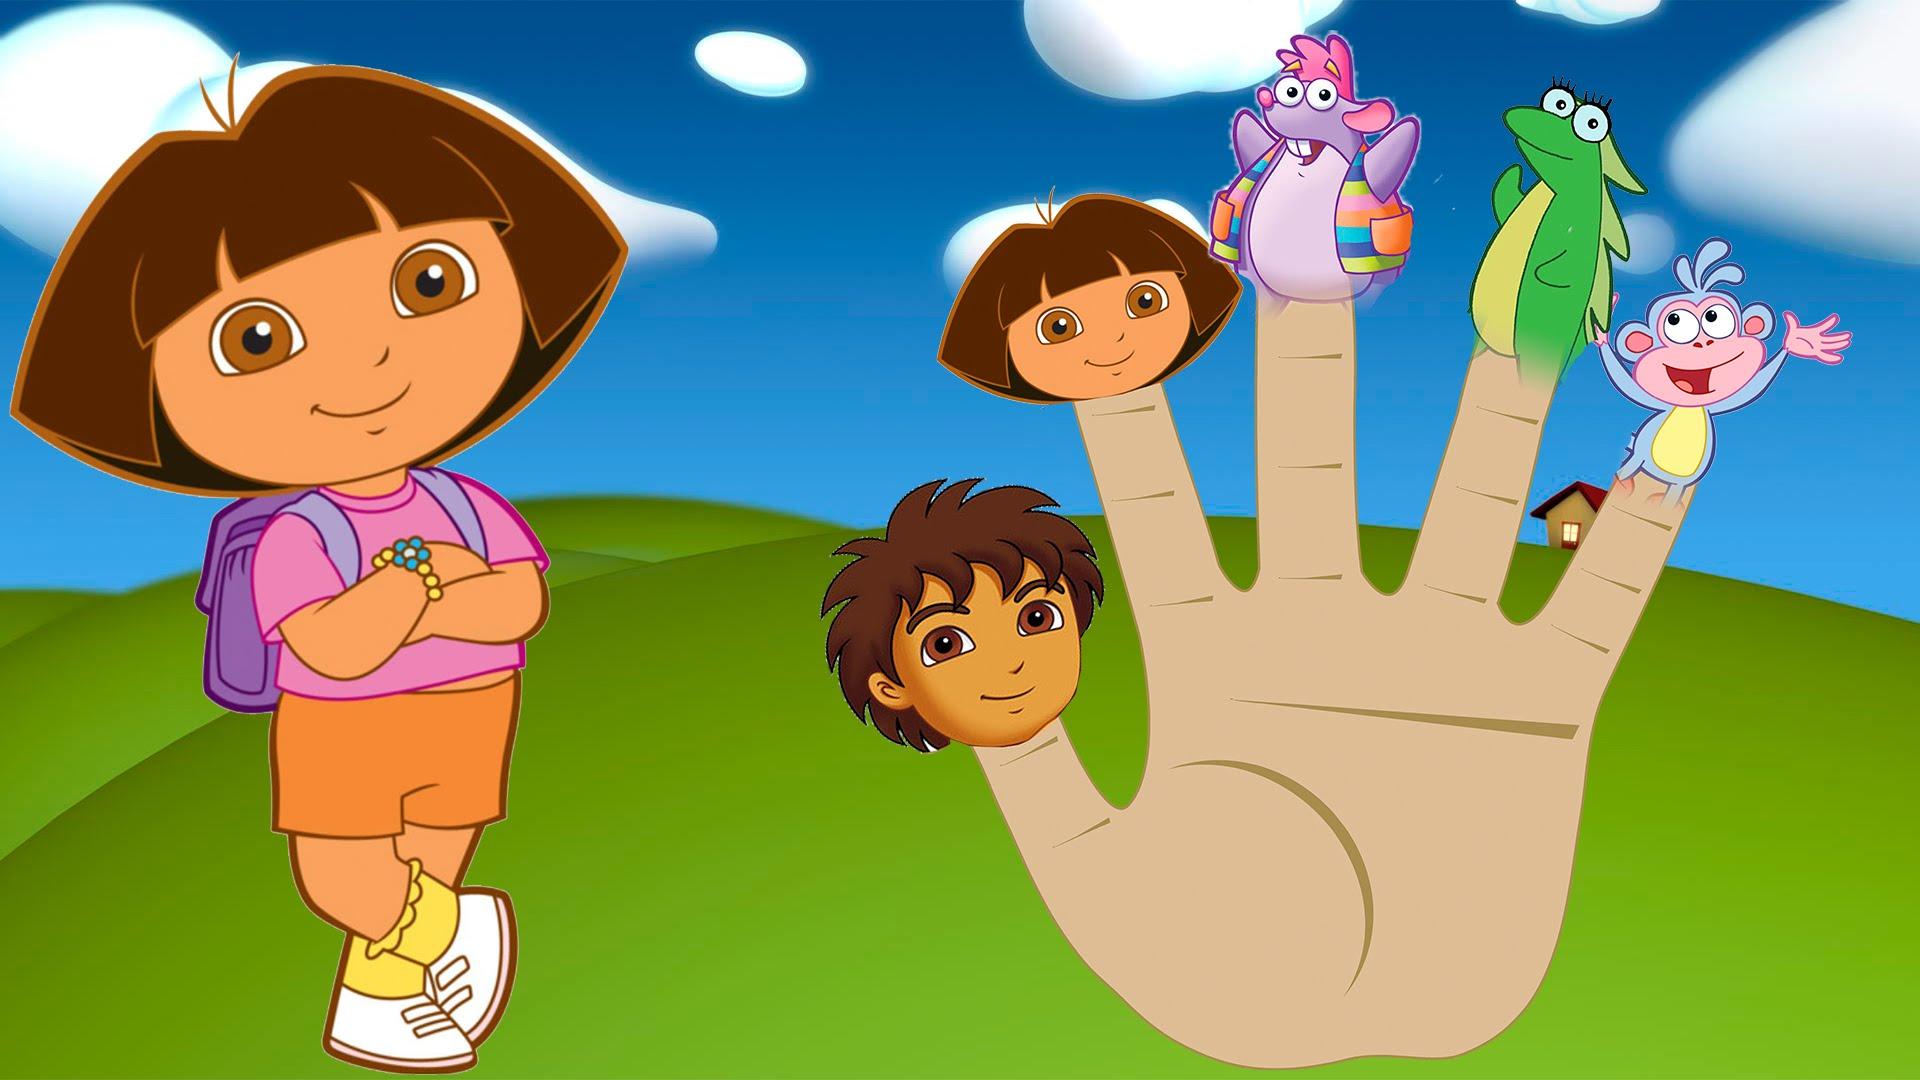 Cute Cartoon Hd Wallpapers Free Download Dora Backgrounds Download Pixelstalk Net